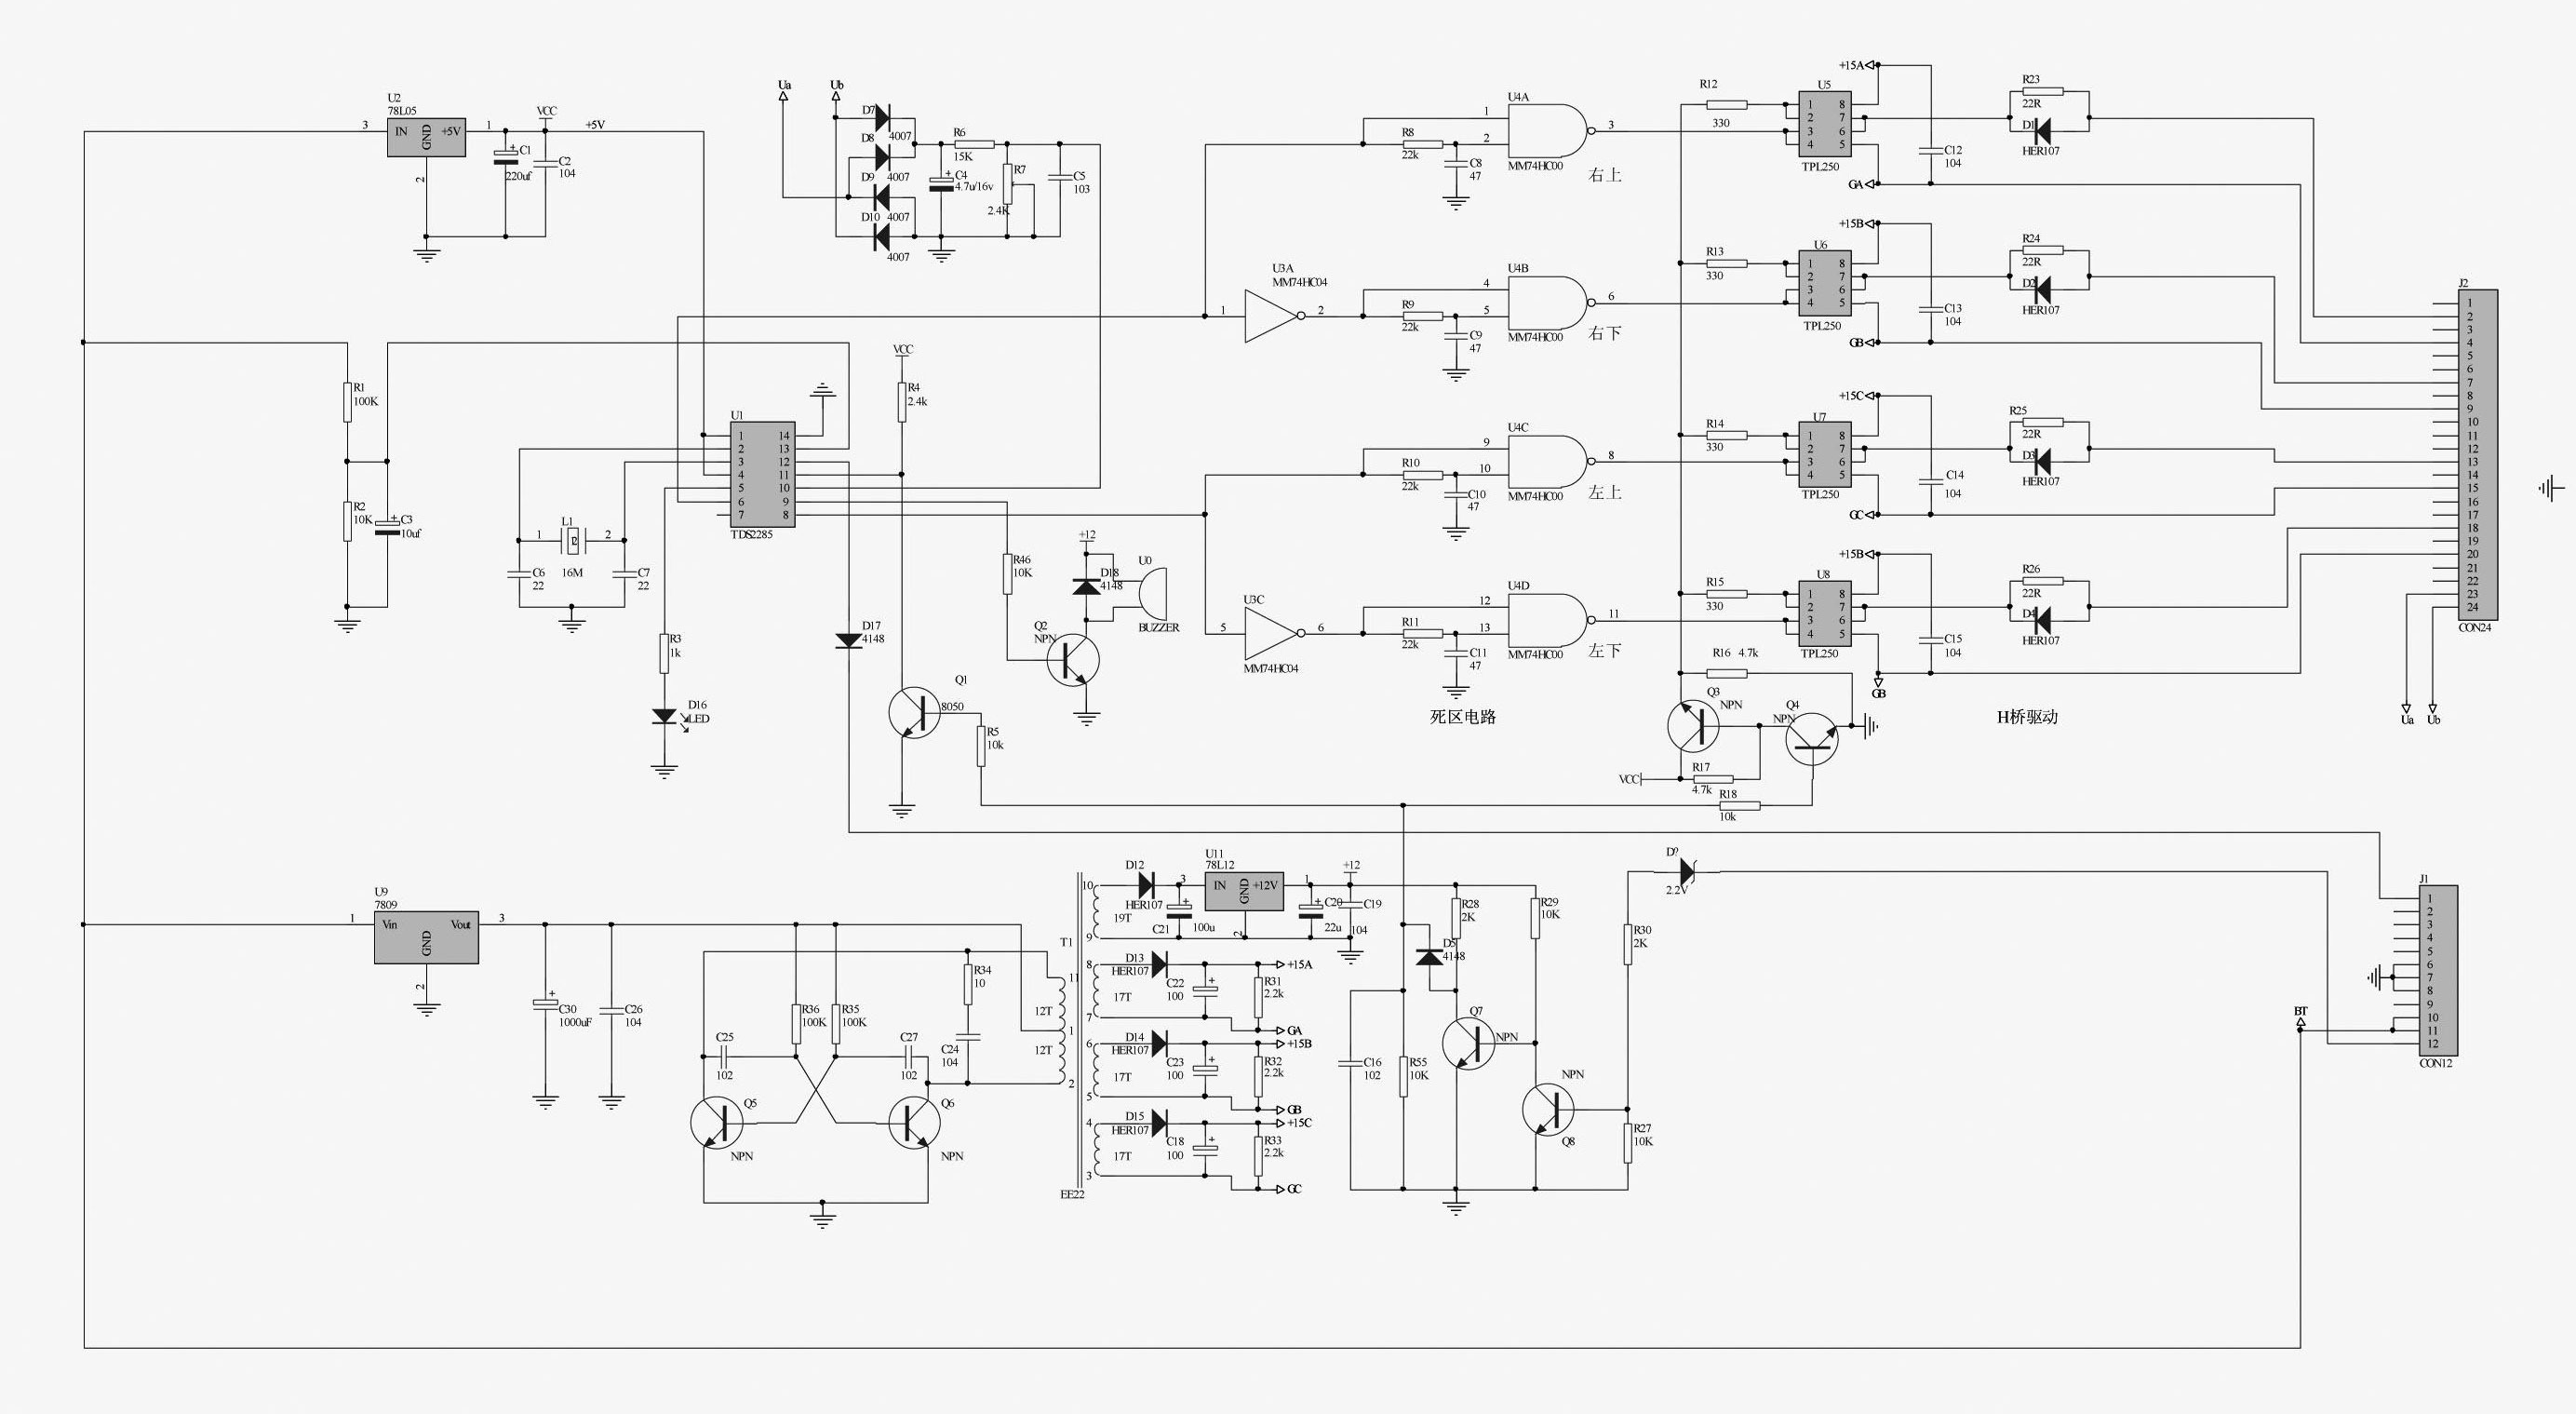 dc to ac inverter diagram 2000 vw beetle wiring 12 volt 1000 watt power design process gohz